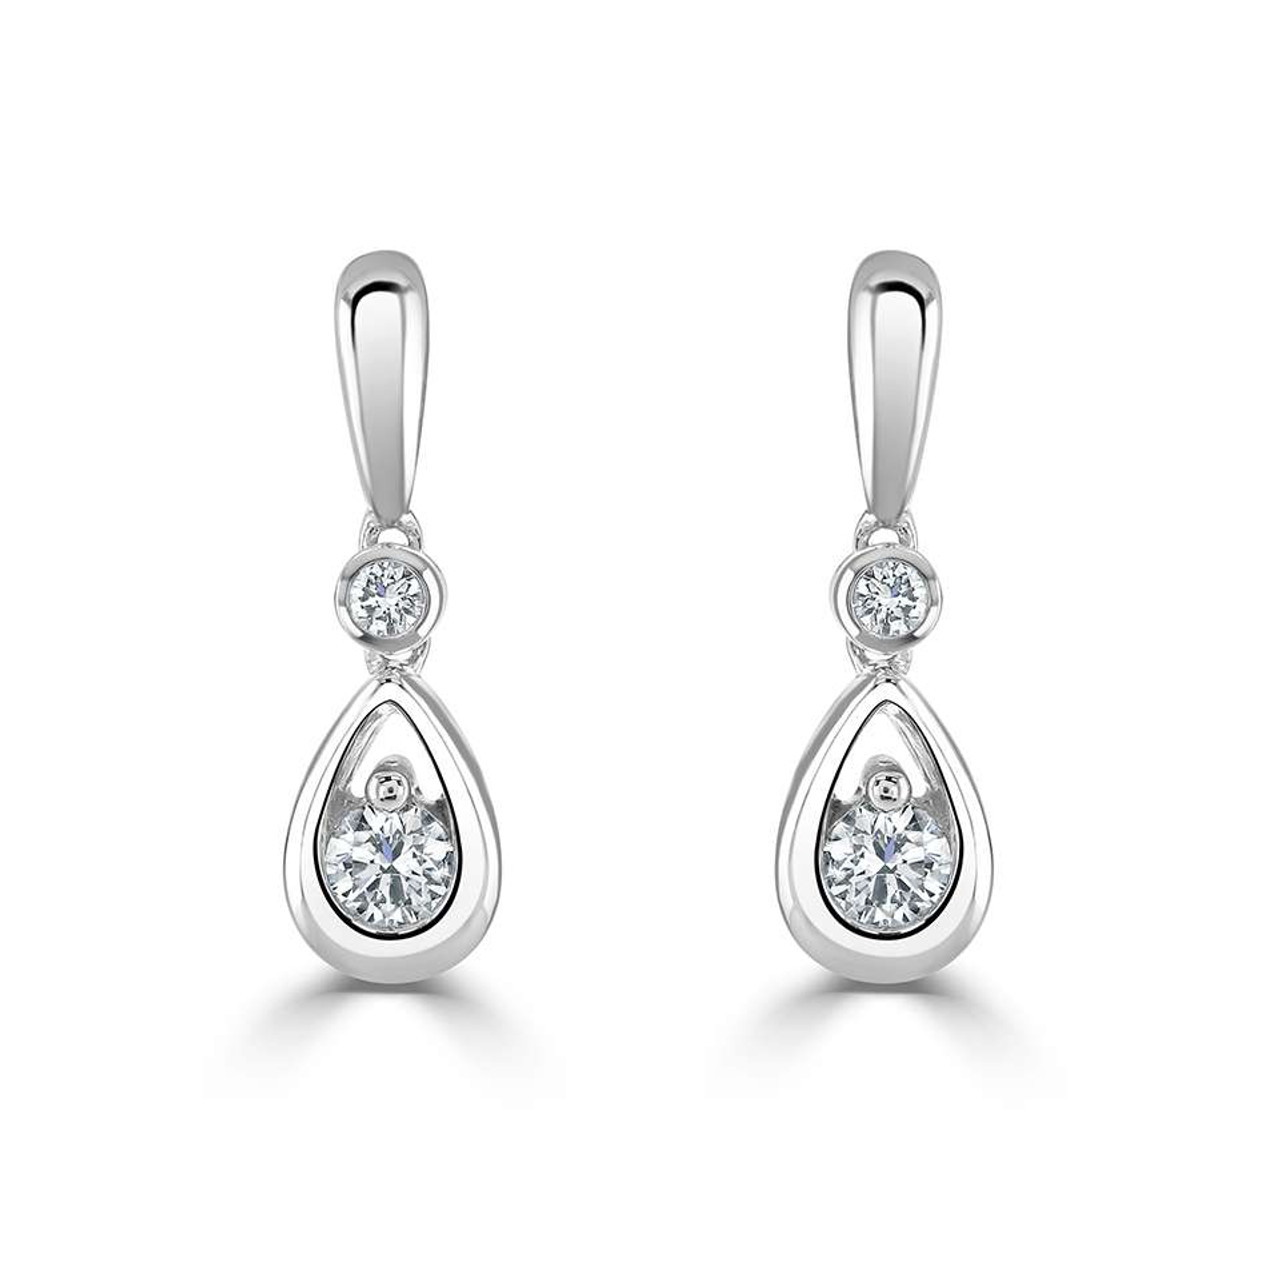 18ct White Gold Diamond Droplet Drop Earrings